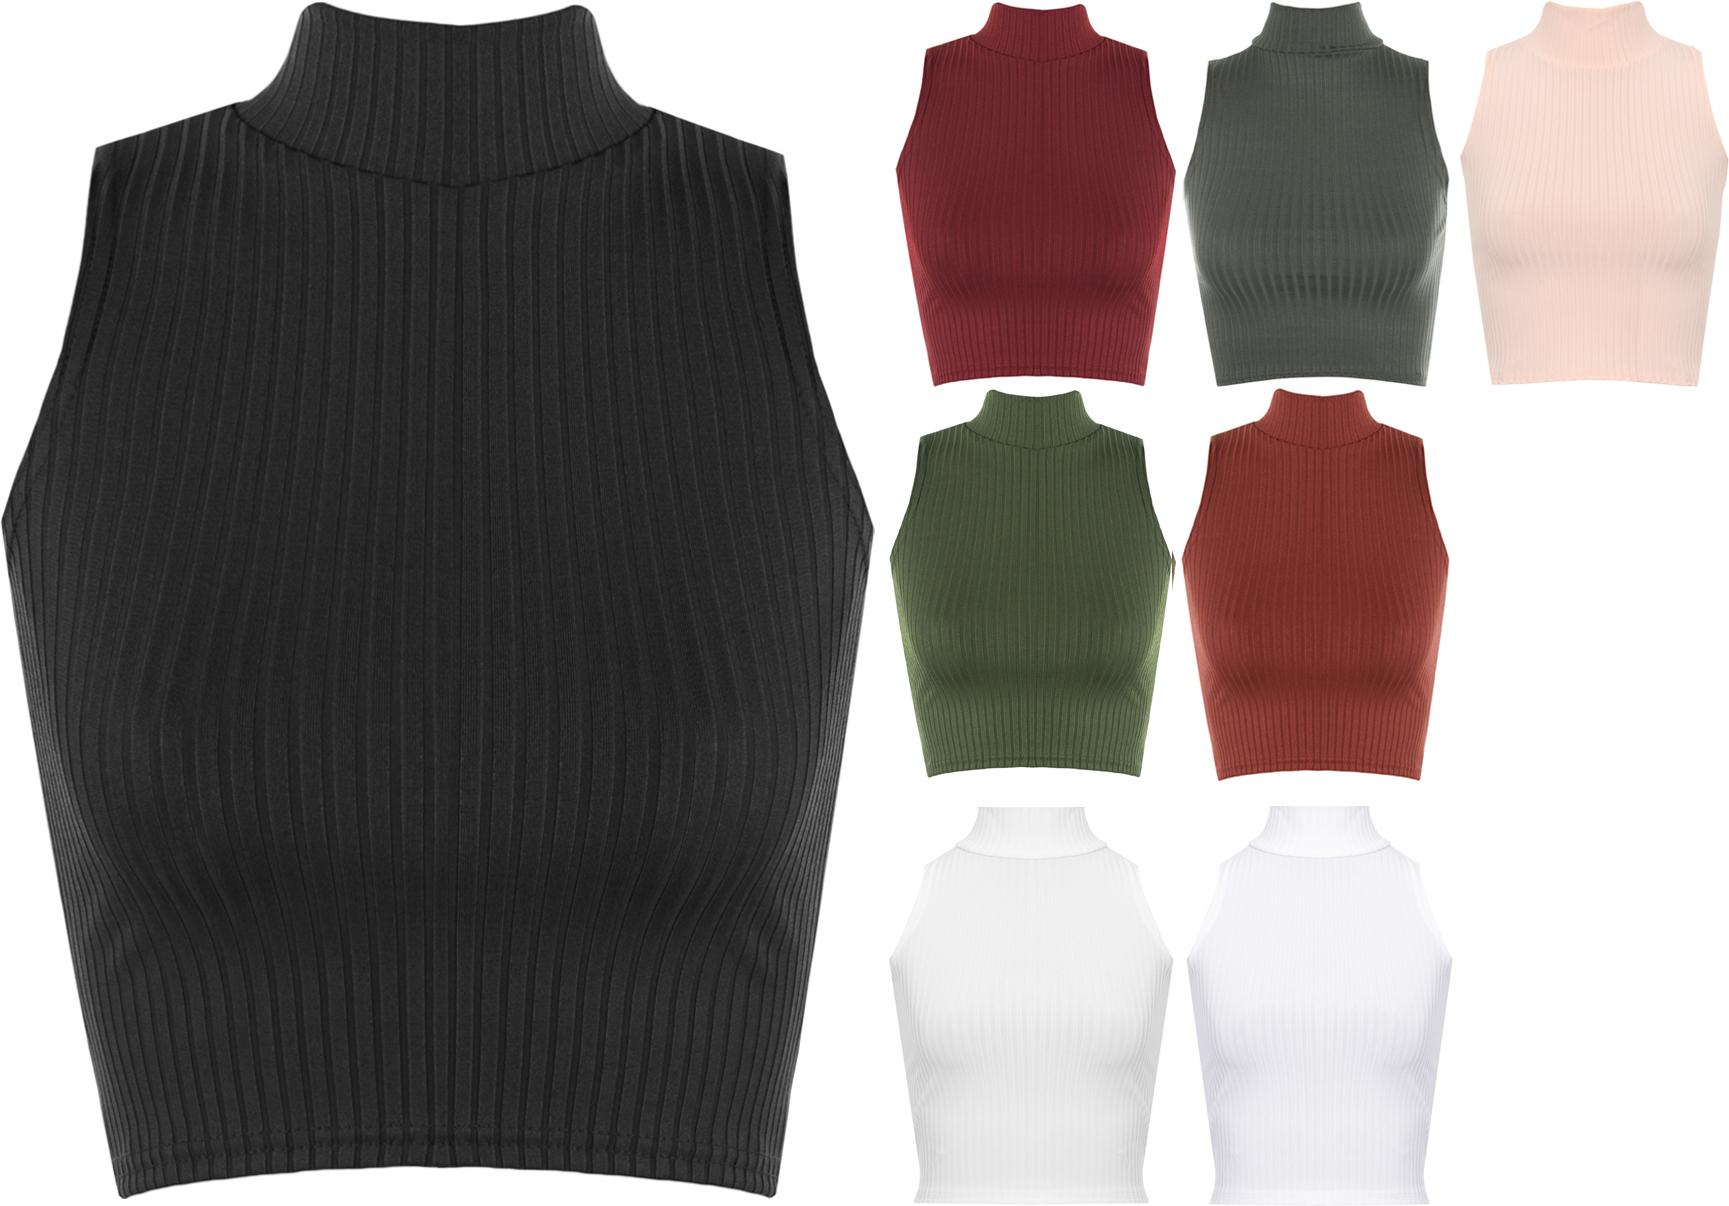 Free Knitting Pattern Ladies V Neck Vest : New Womens Ribbed Knitted Sleeveless Short Turtle Neck ...